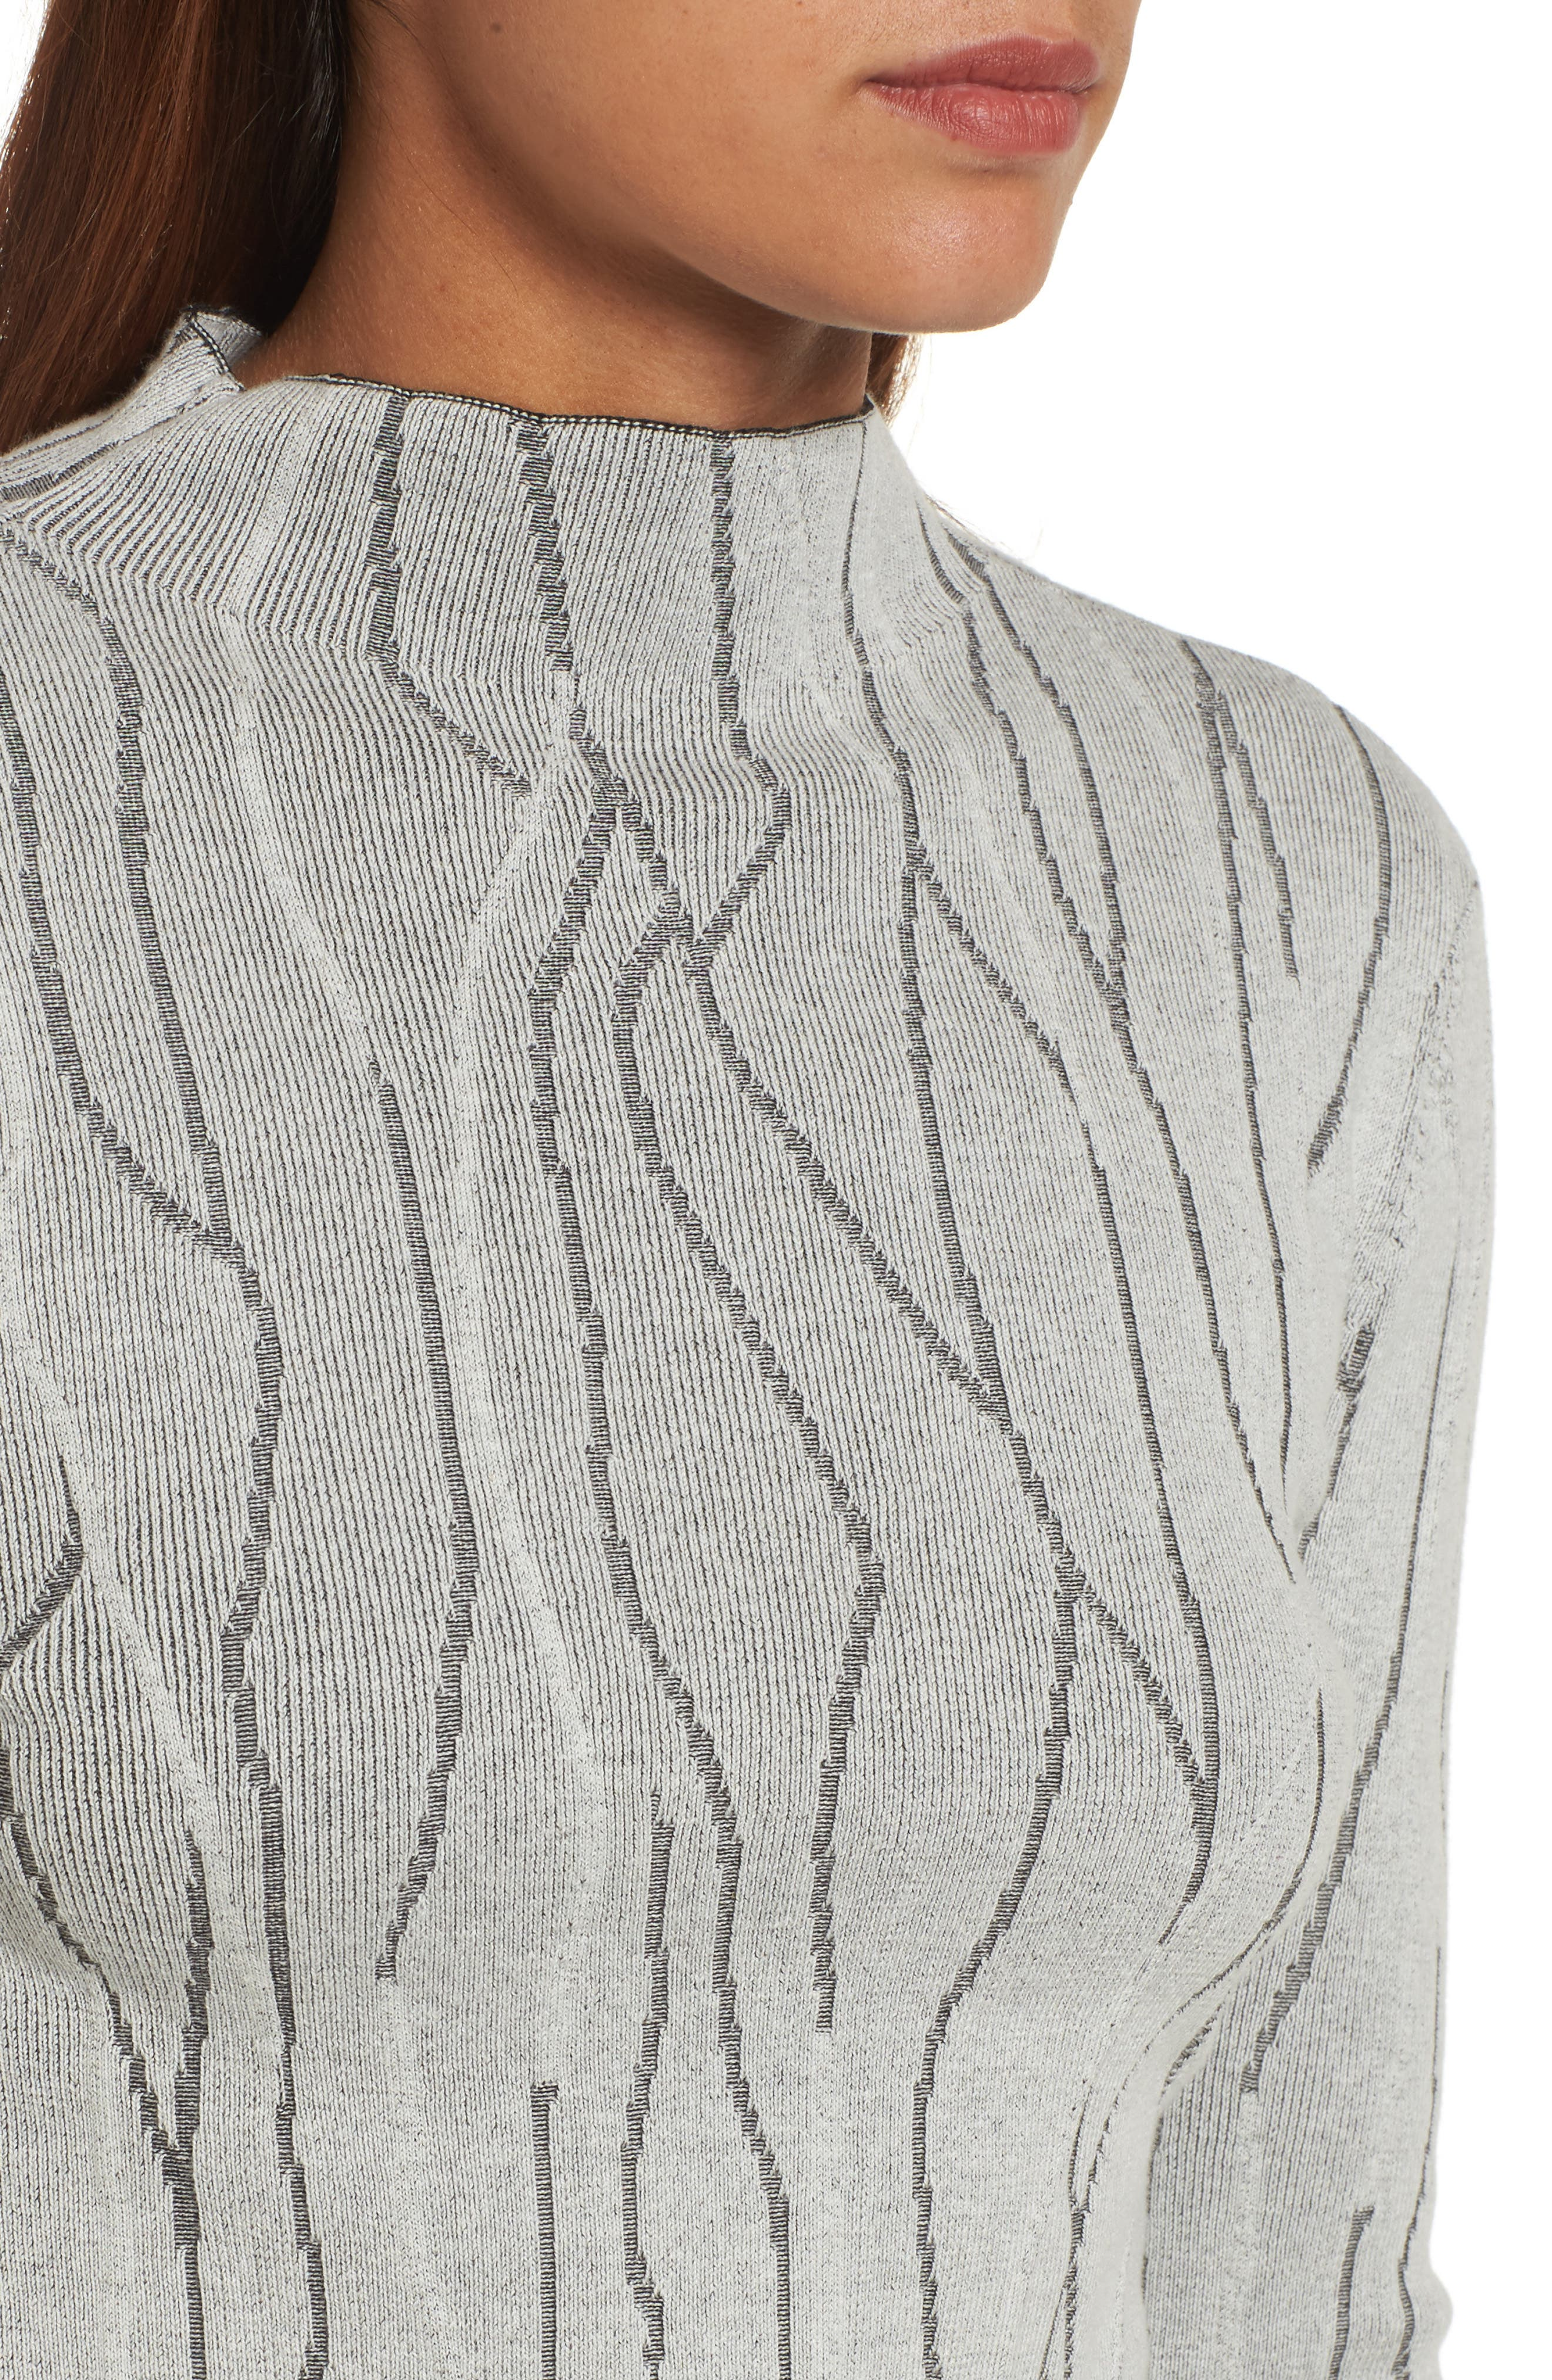 Artisanal Crackle Jacquard Sweater,                             Alternate thumbnail 4, color,                             Chalk